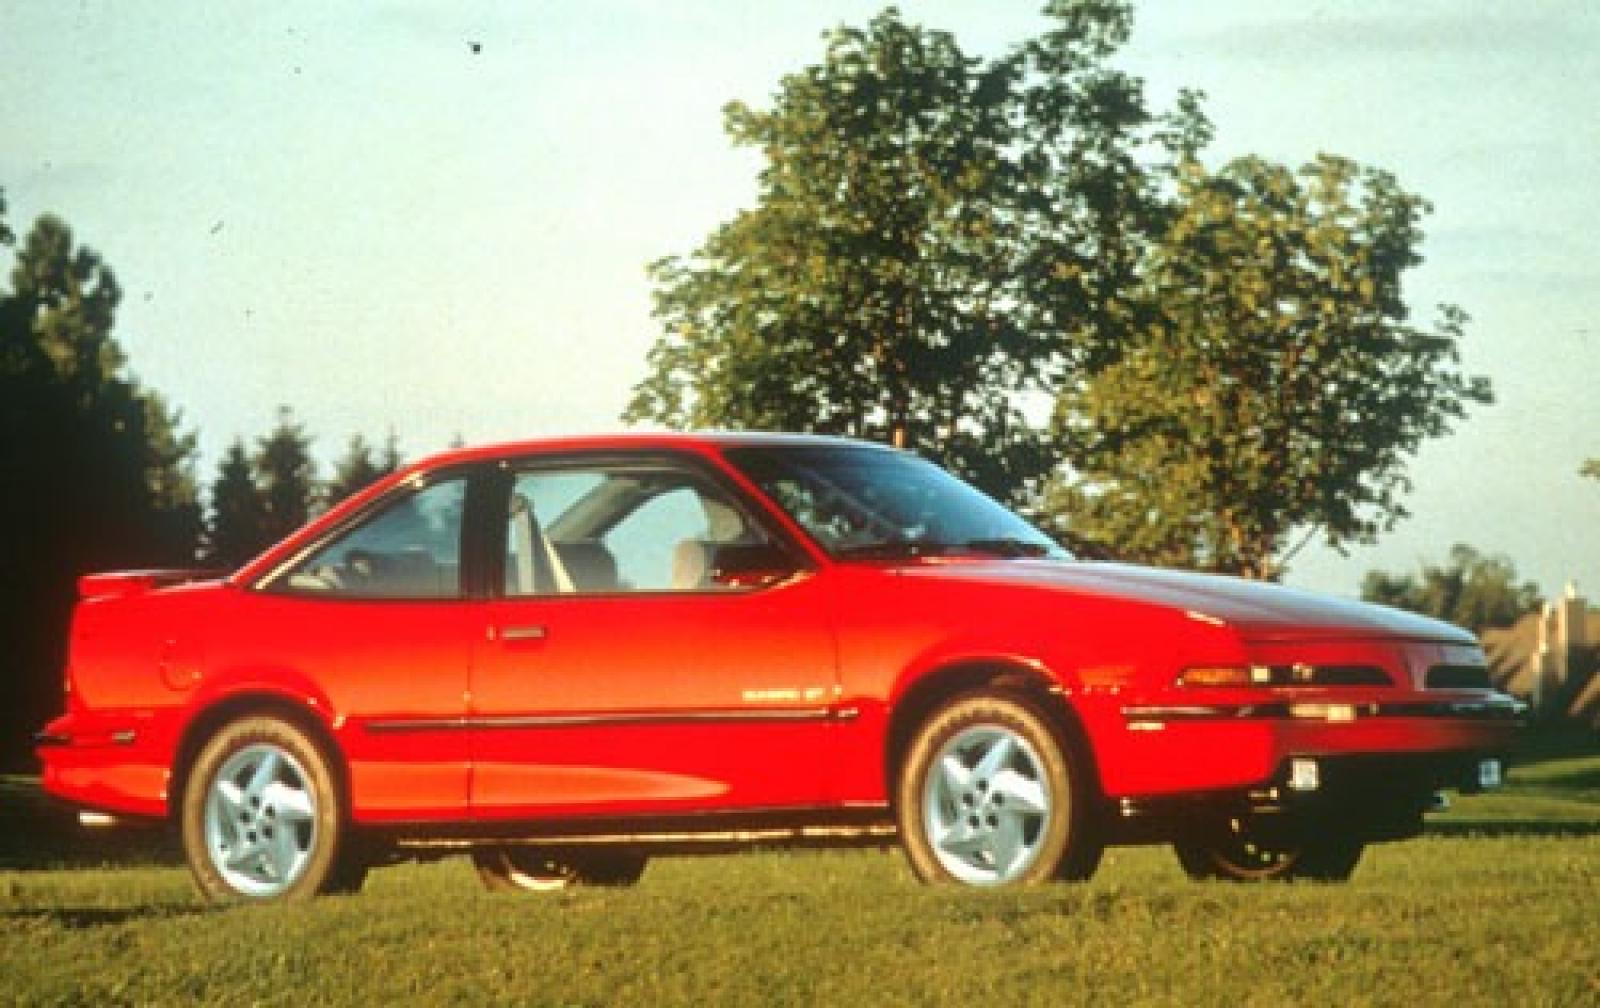 Pontiac Sunbird Ii Coupe Exterior